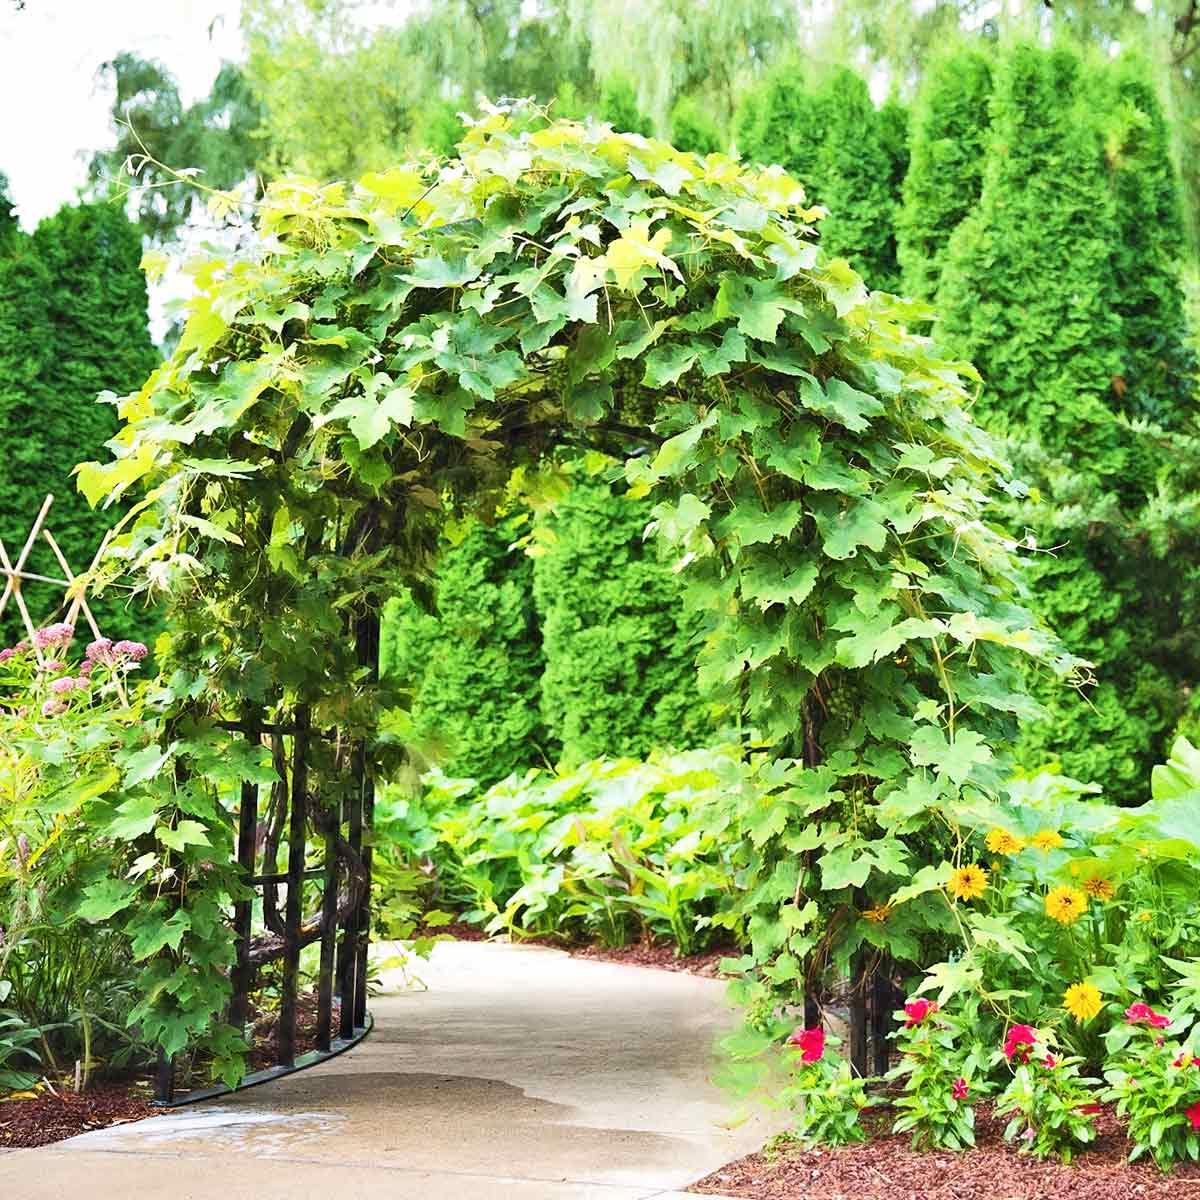 Pergola, Tonnelle Et Arche De Jardin | Jardins-Animes pour Arceau Jardin